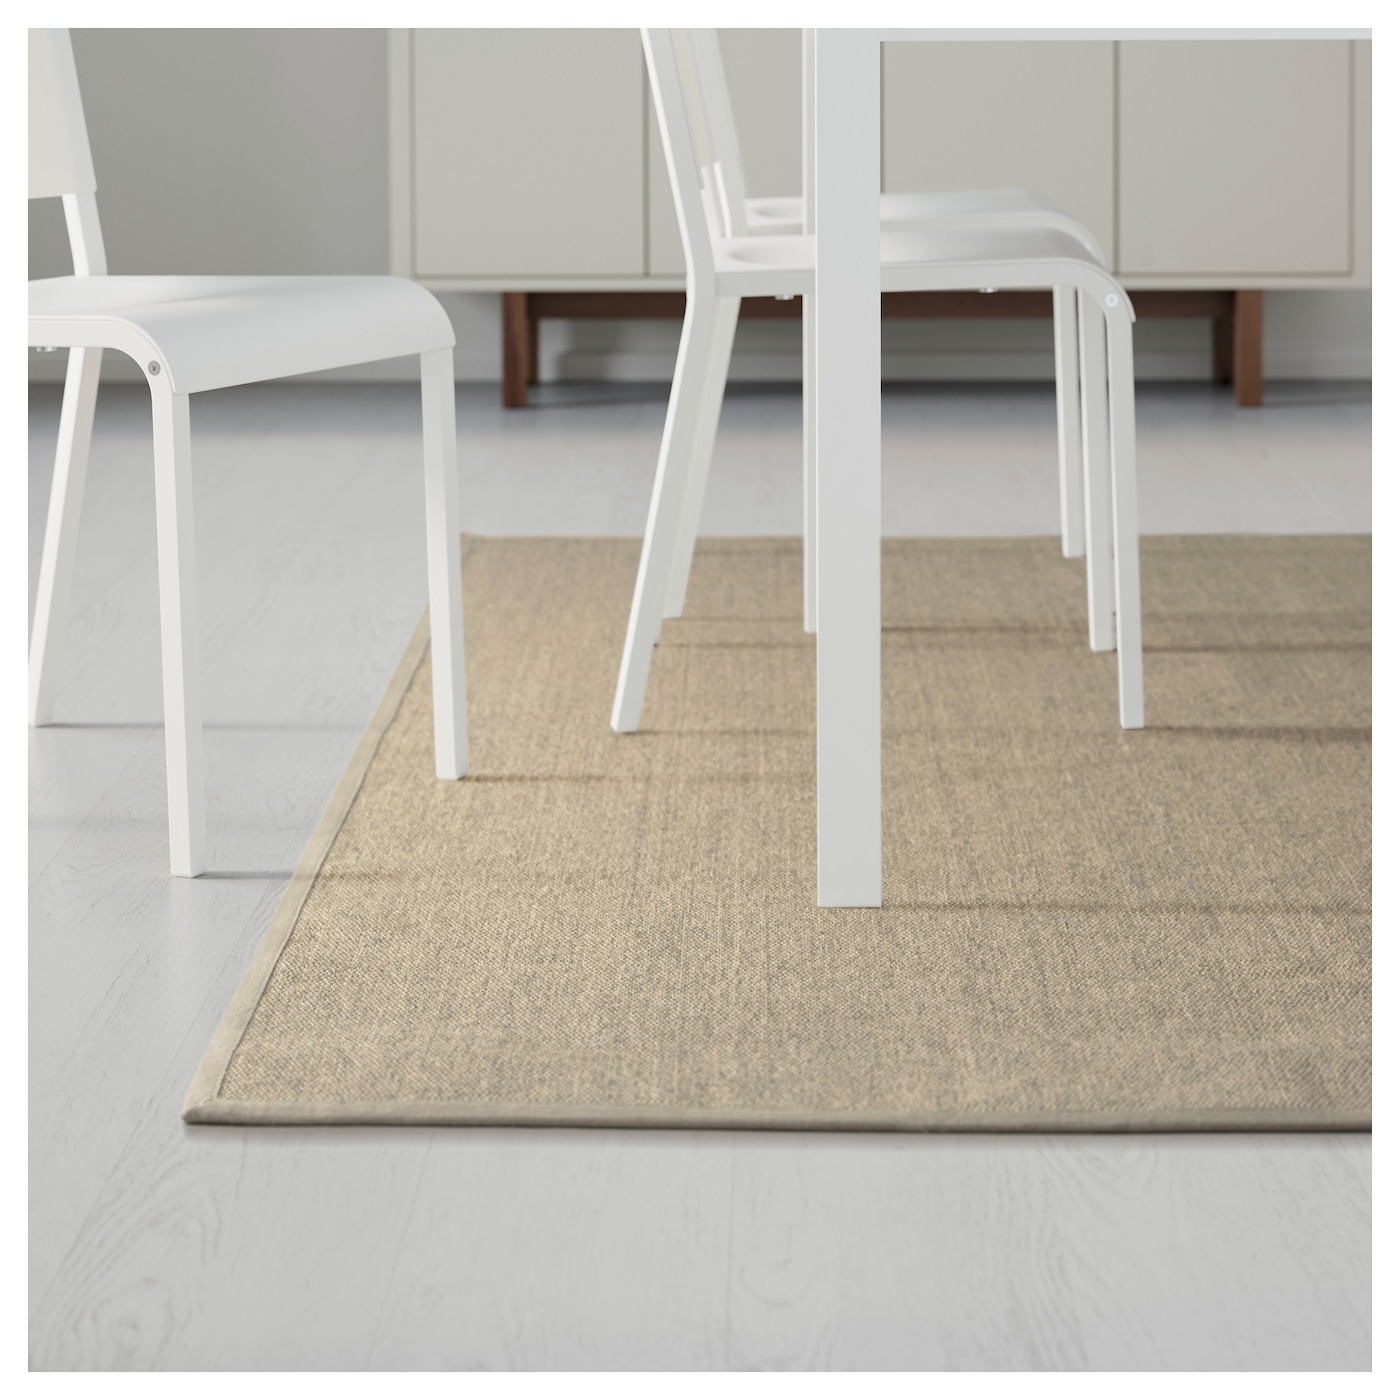 Osted tapis tiss plat naturel 160x230 cm ikea - Tapis tisse a plat ...